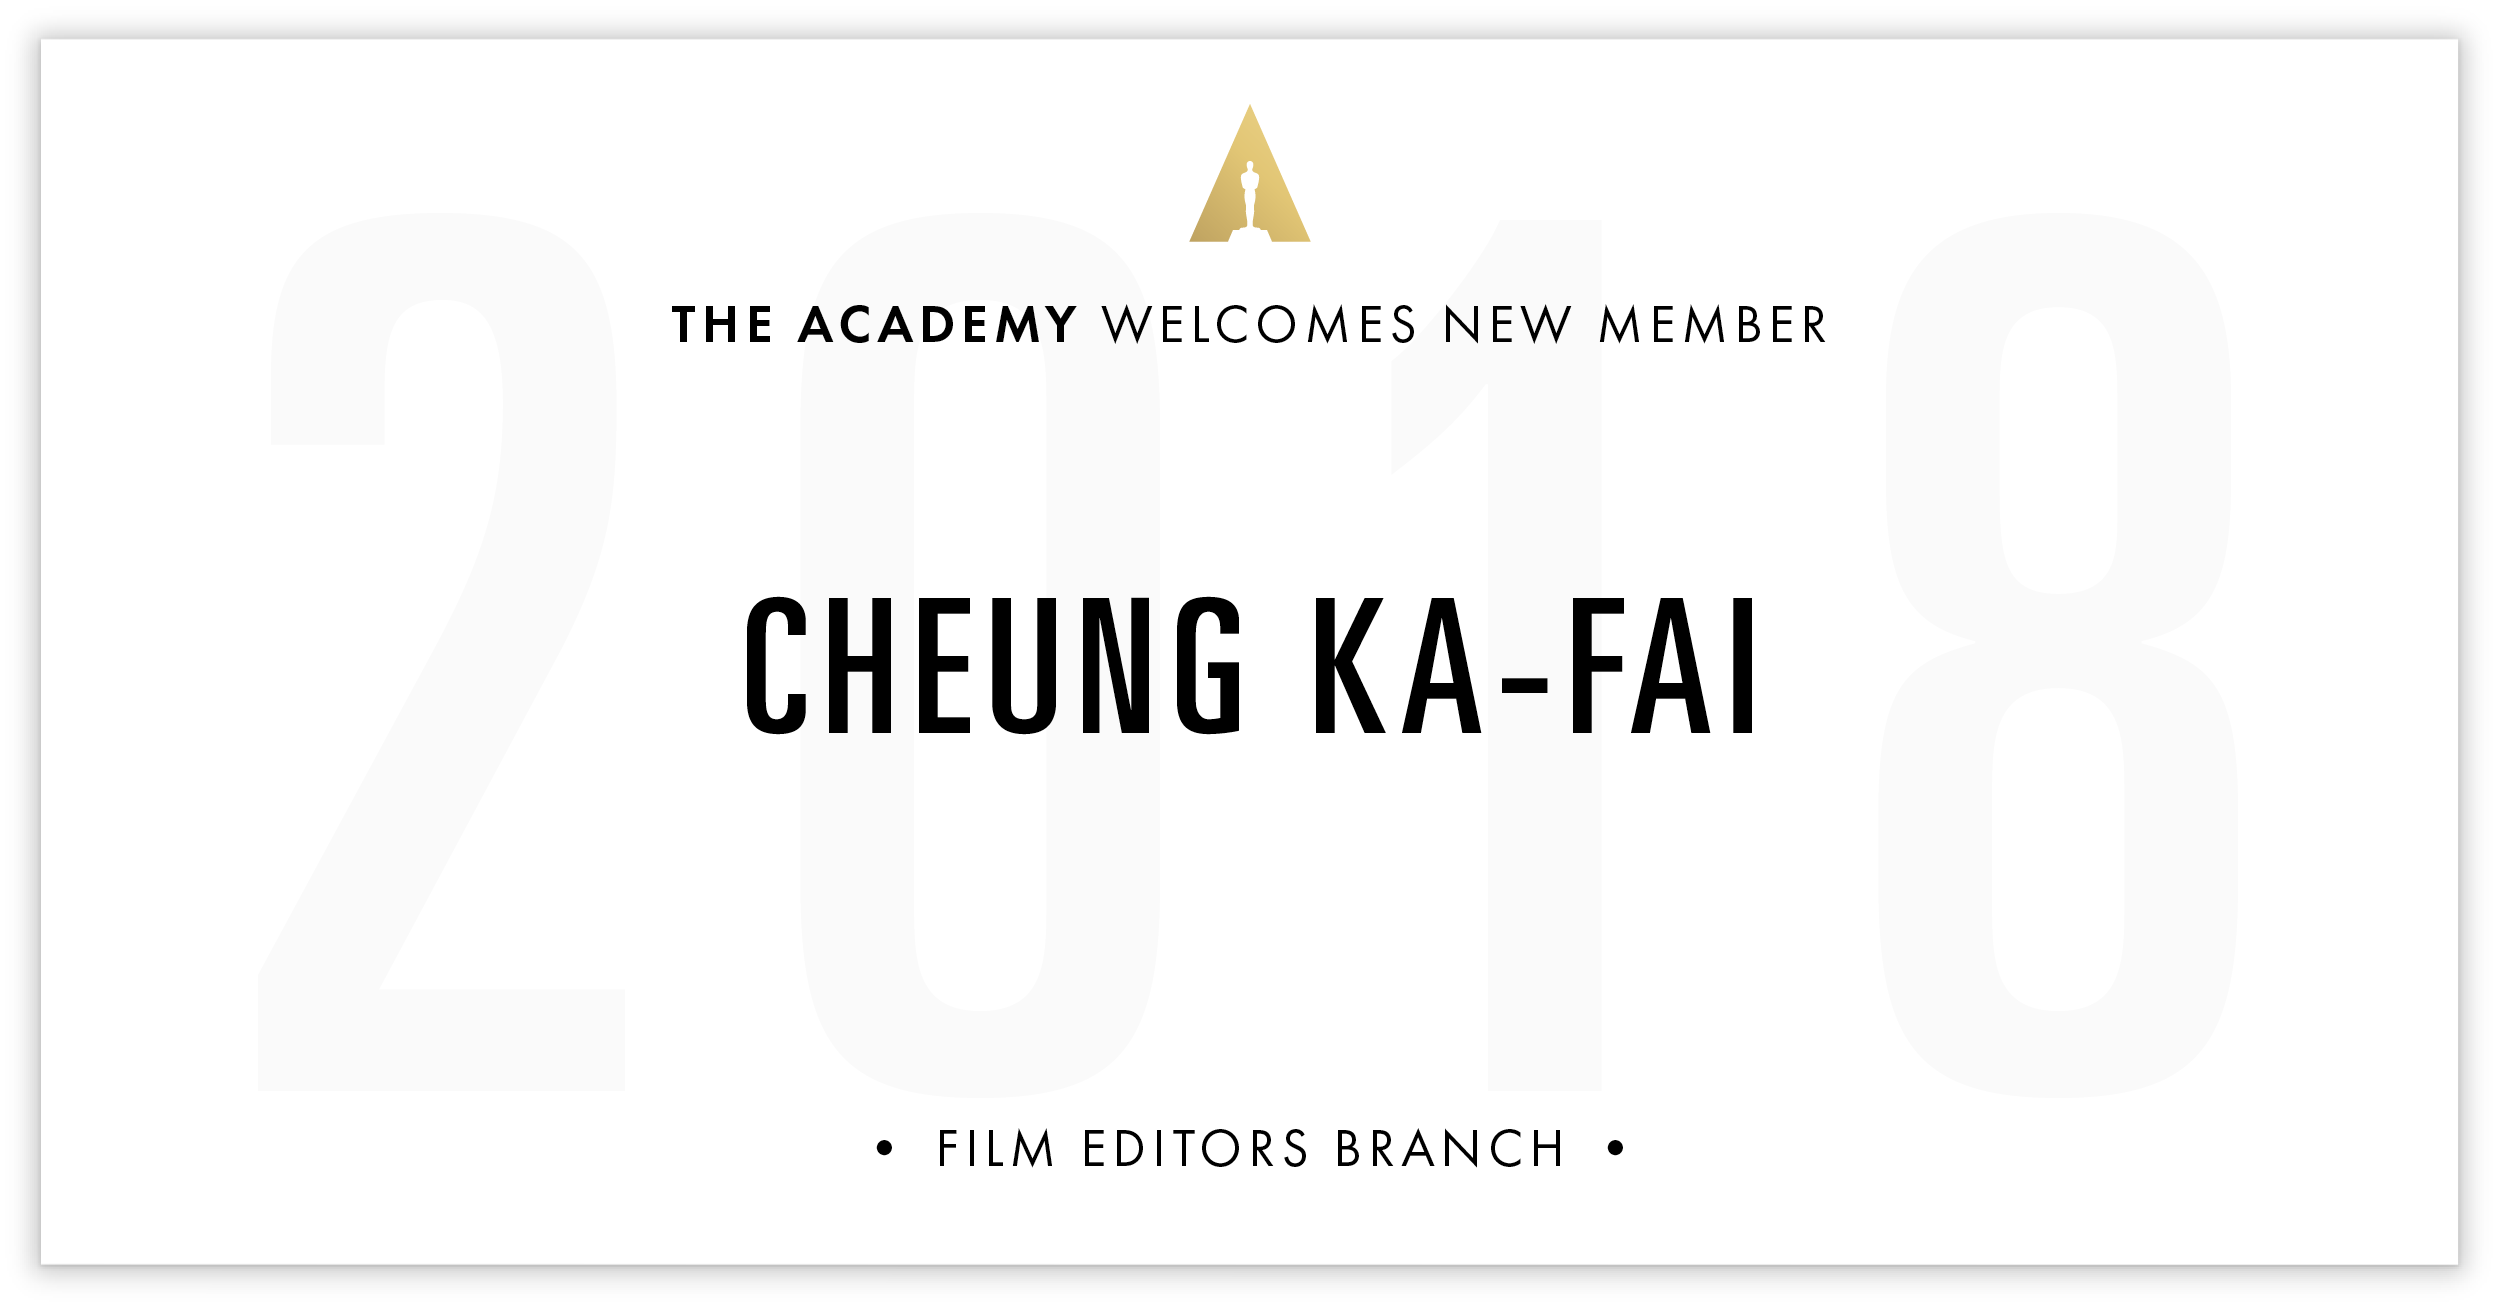 Cheung Ka-Fai is invited!